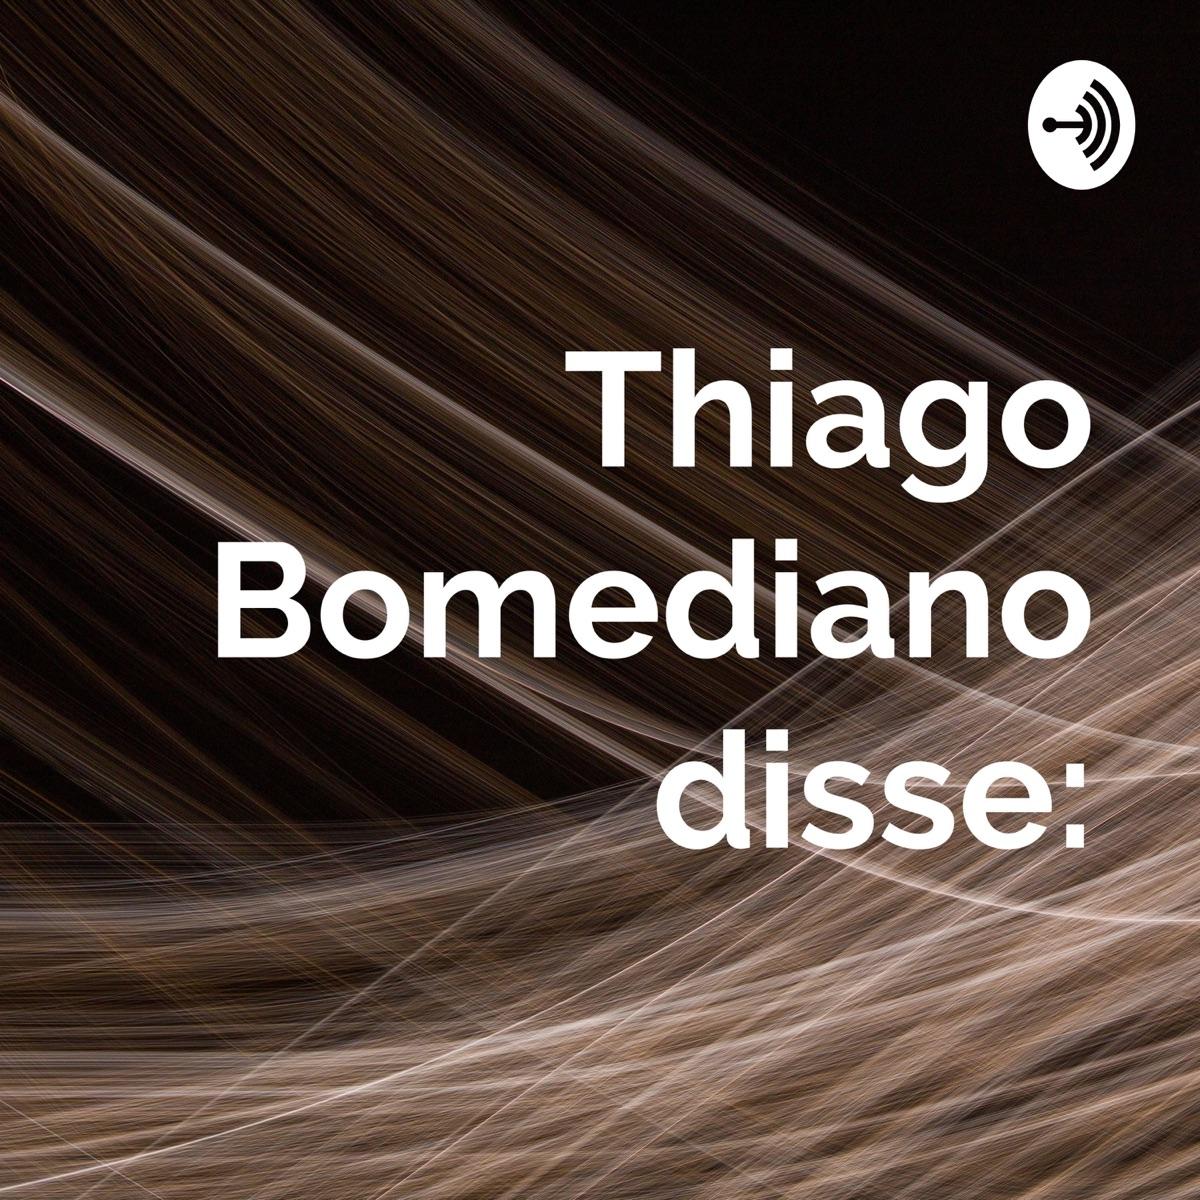 Thiago Bomediano disse: